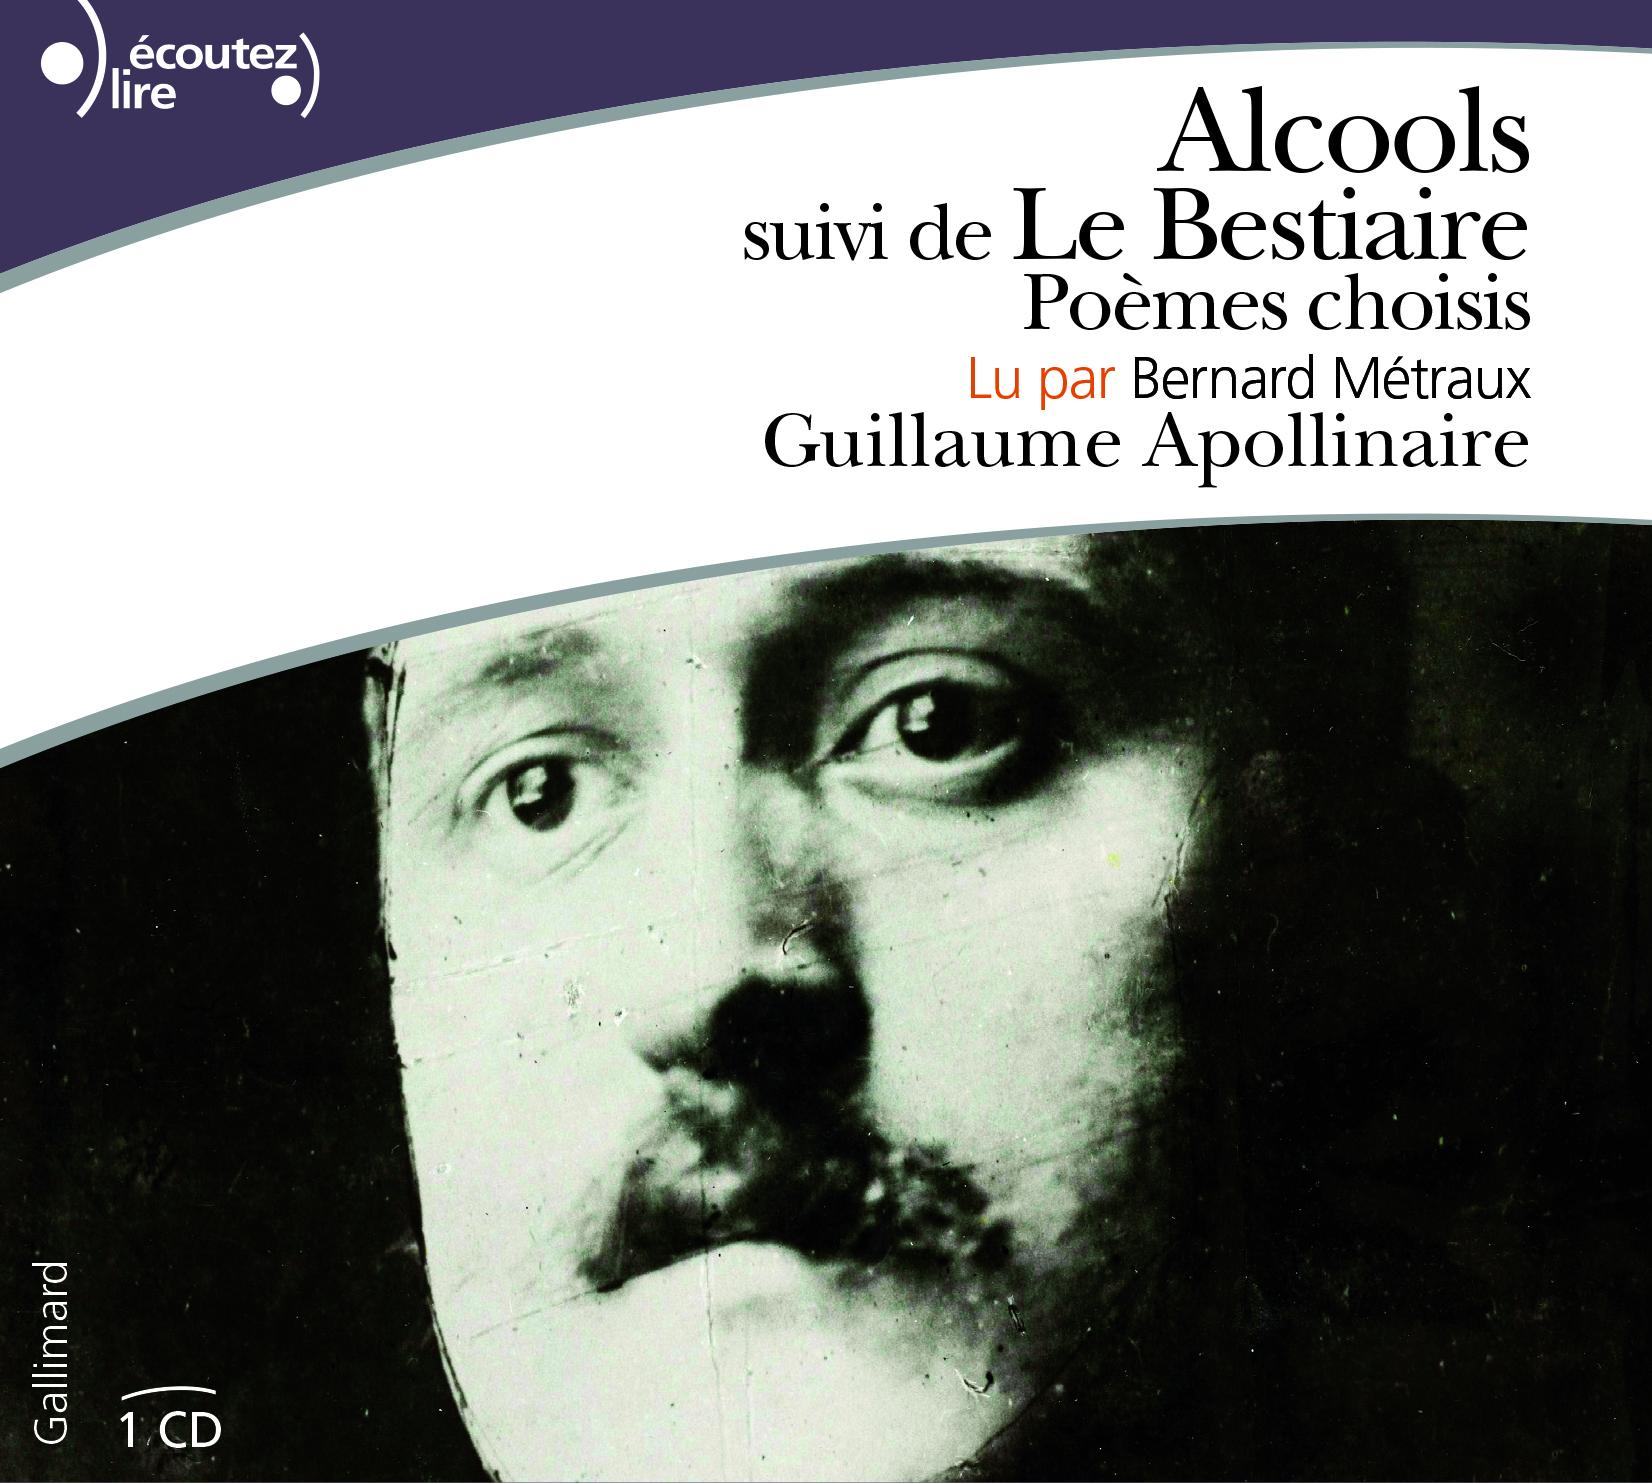 ALCOOLS CD (POEMES CHOISIS)